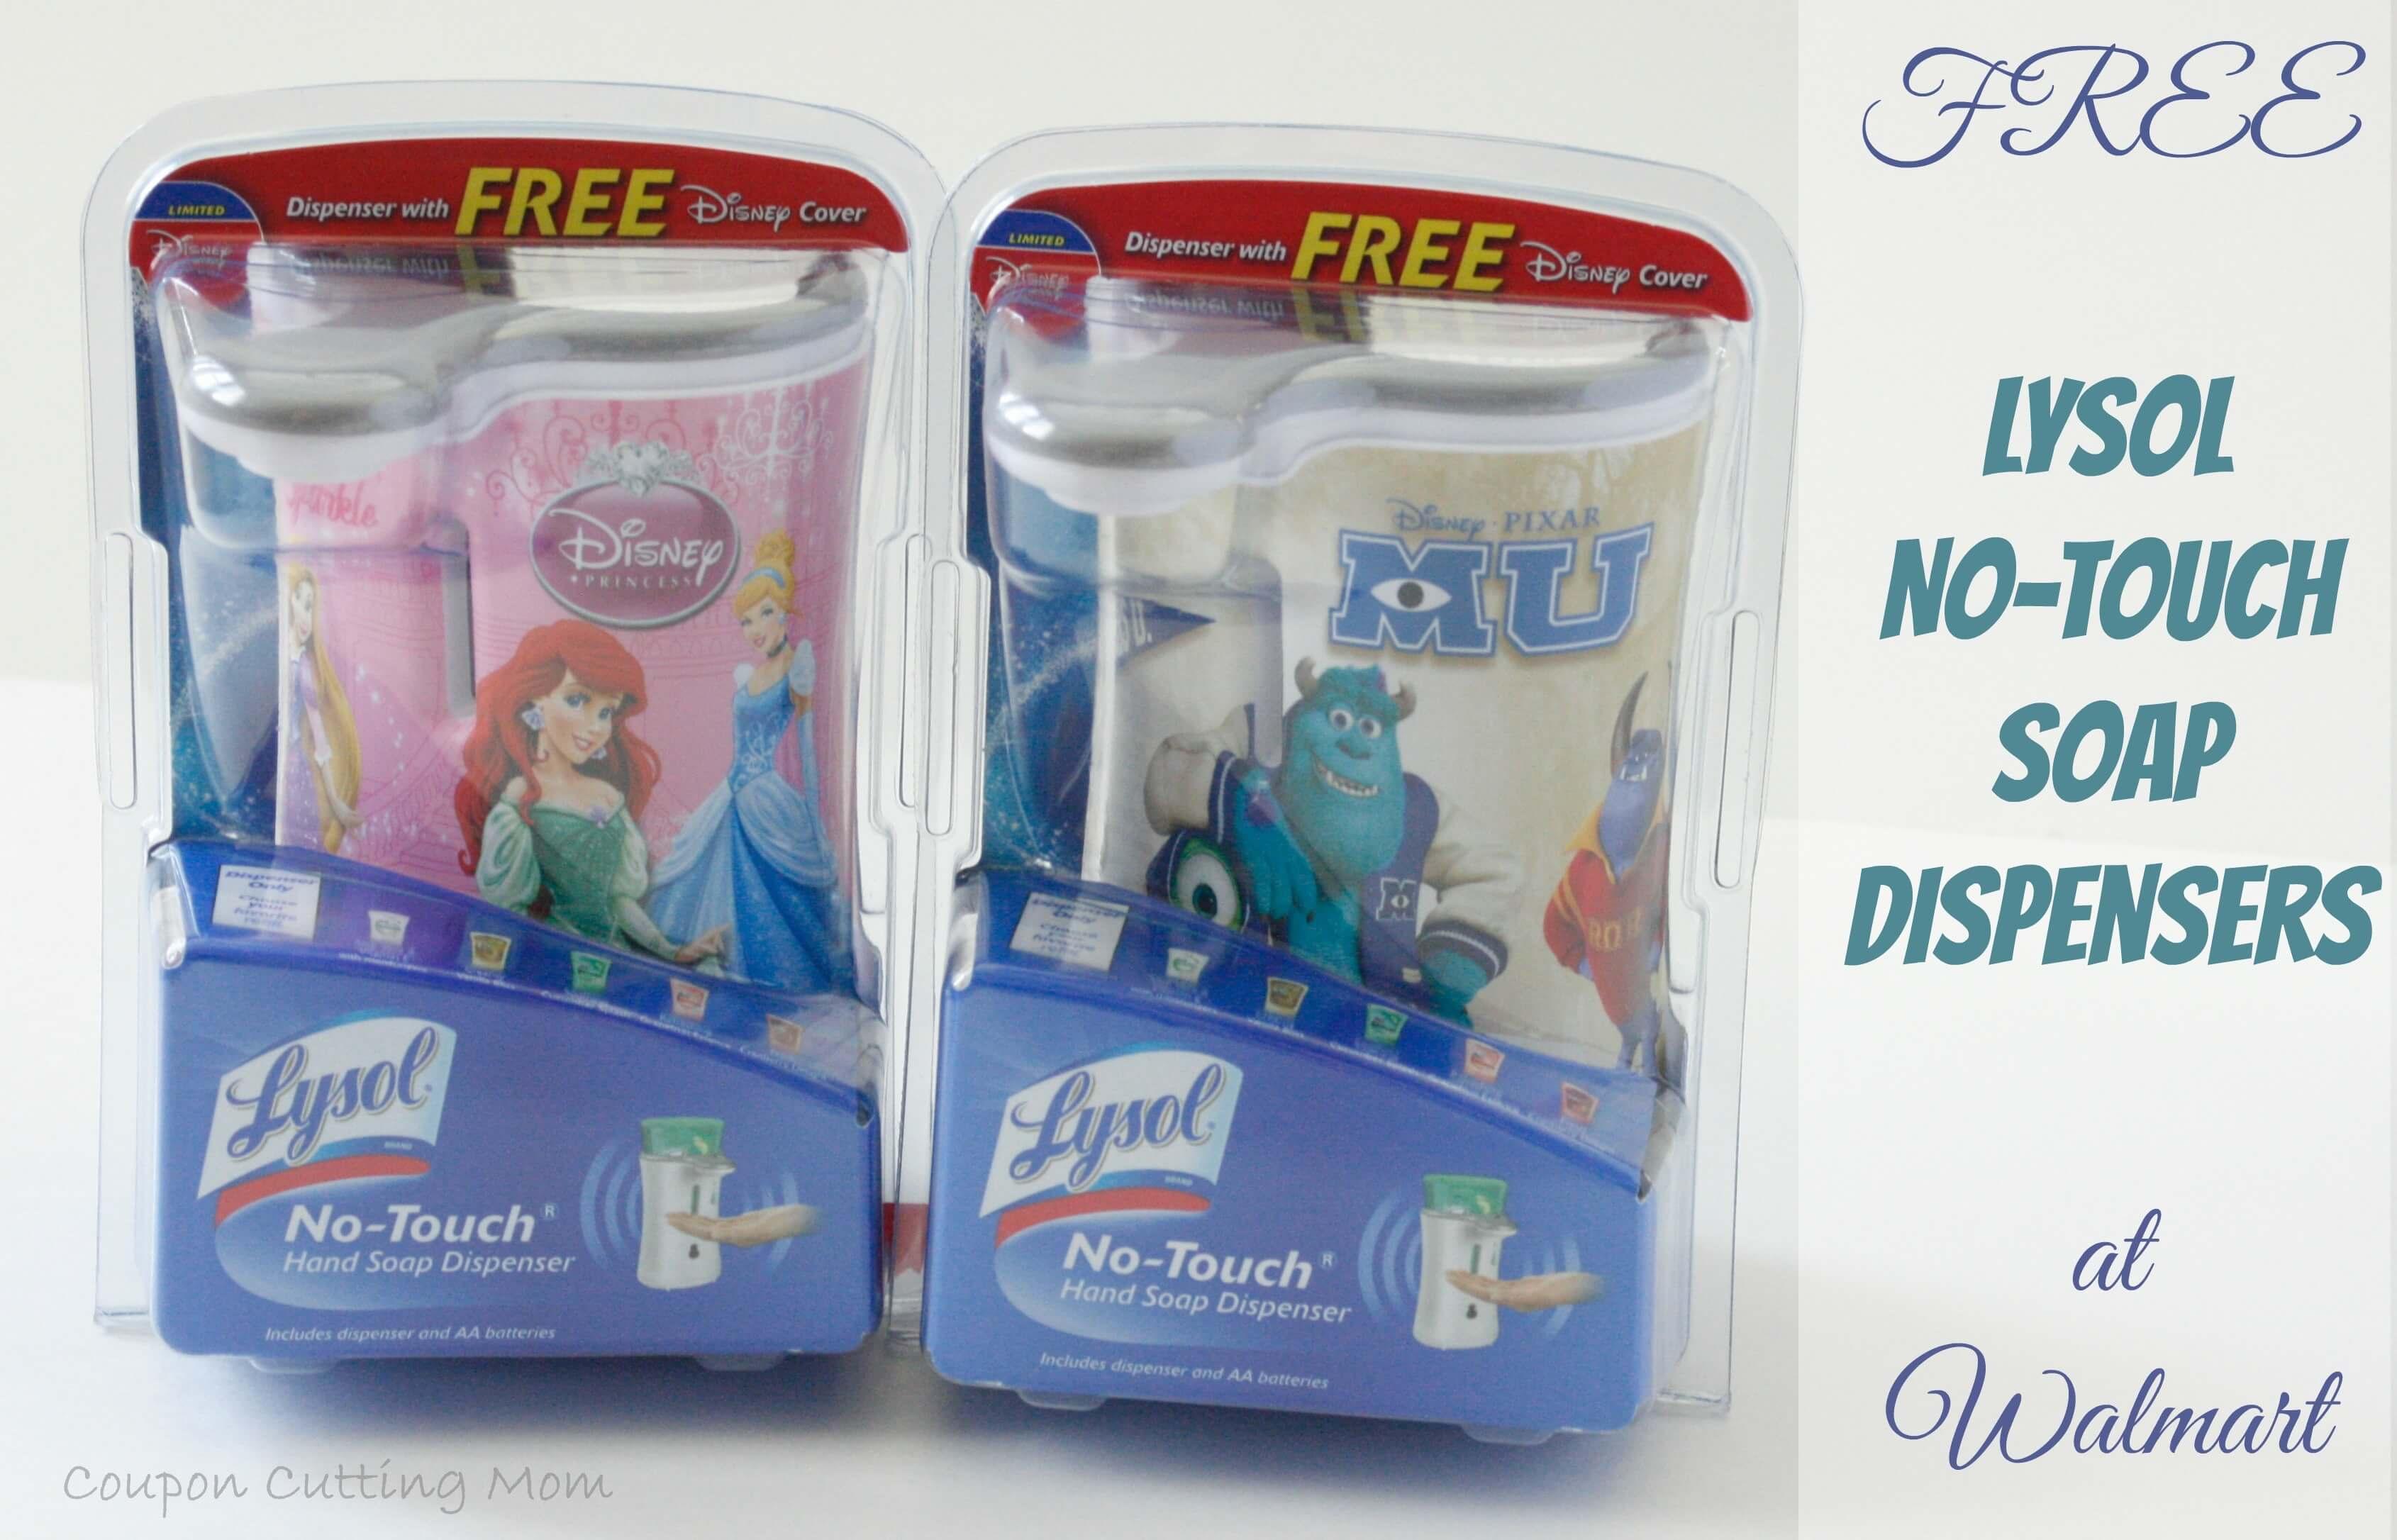 Walmart: Free Lysol No-Touch Soap Dispensers - Lysol Hands Free Soap Dispenser Printable Coupon